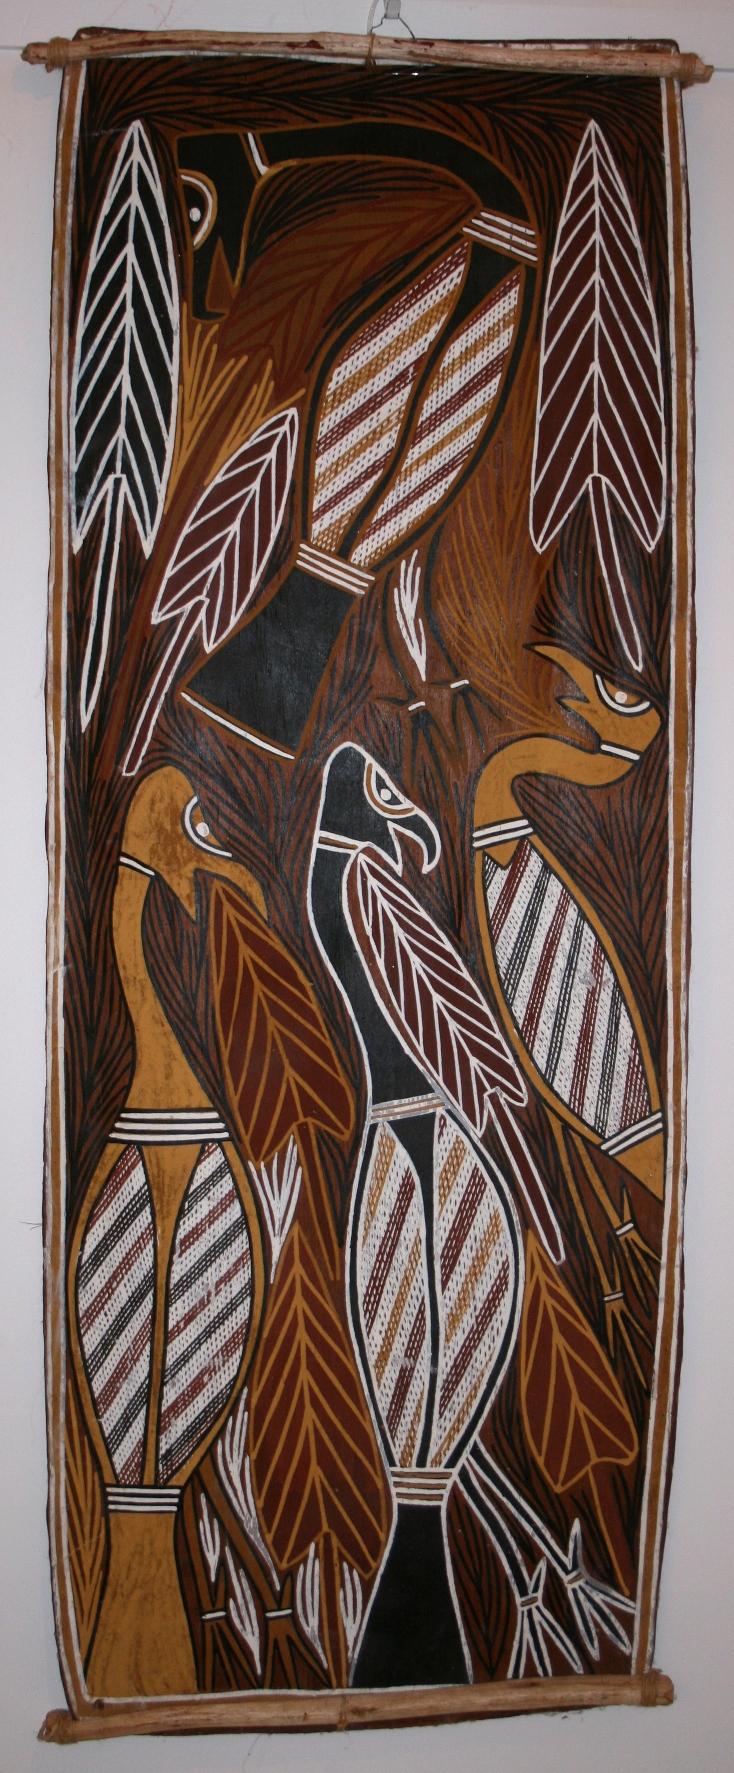 8-george milpurrpurr (48 x 117cm).jpg